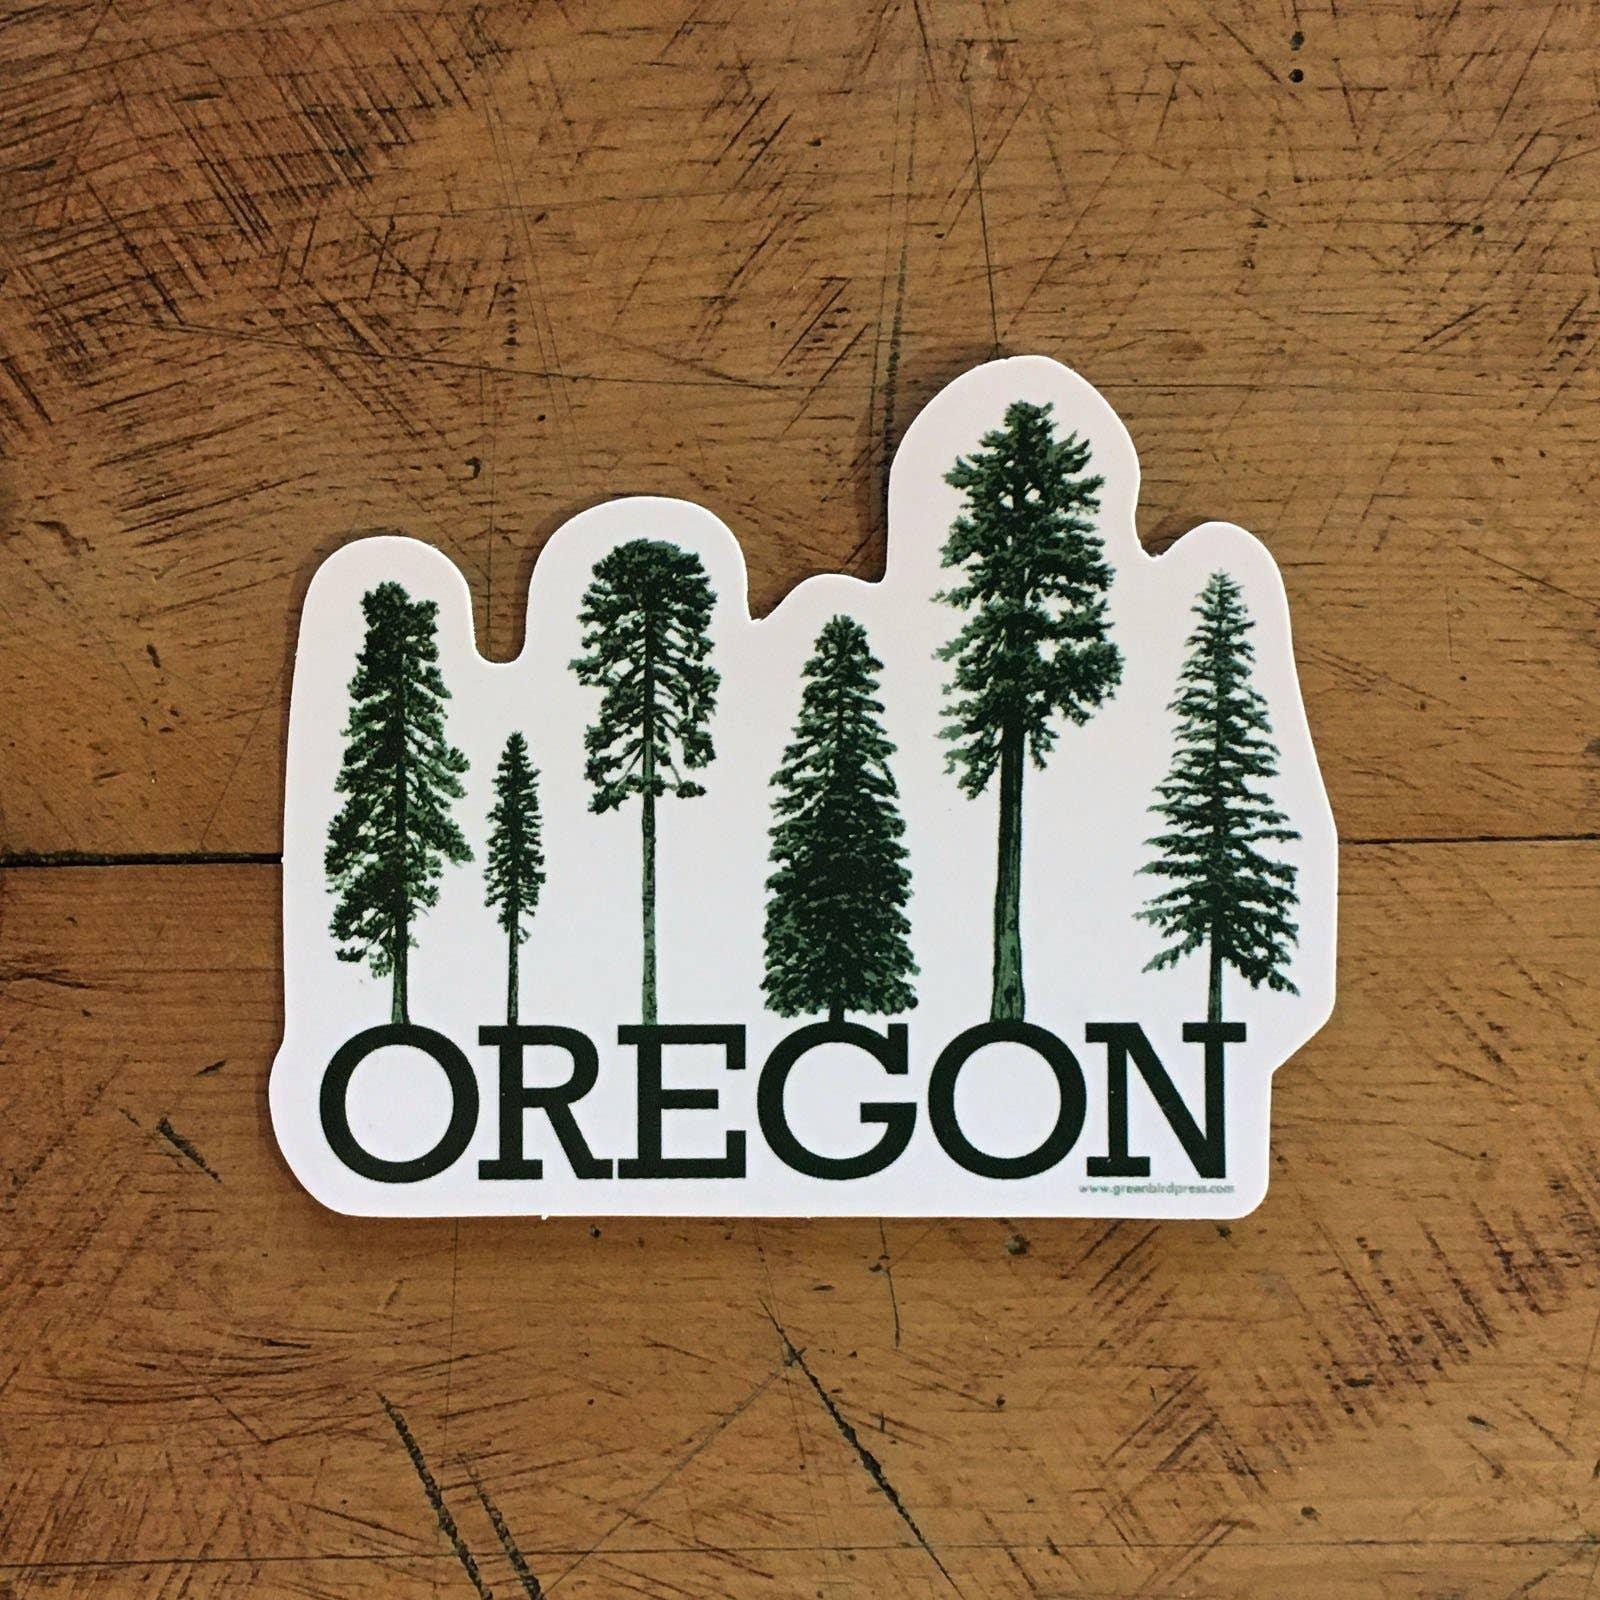 Oregon Conifer Tree Sticker | Trada Marketplace